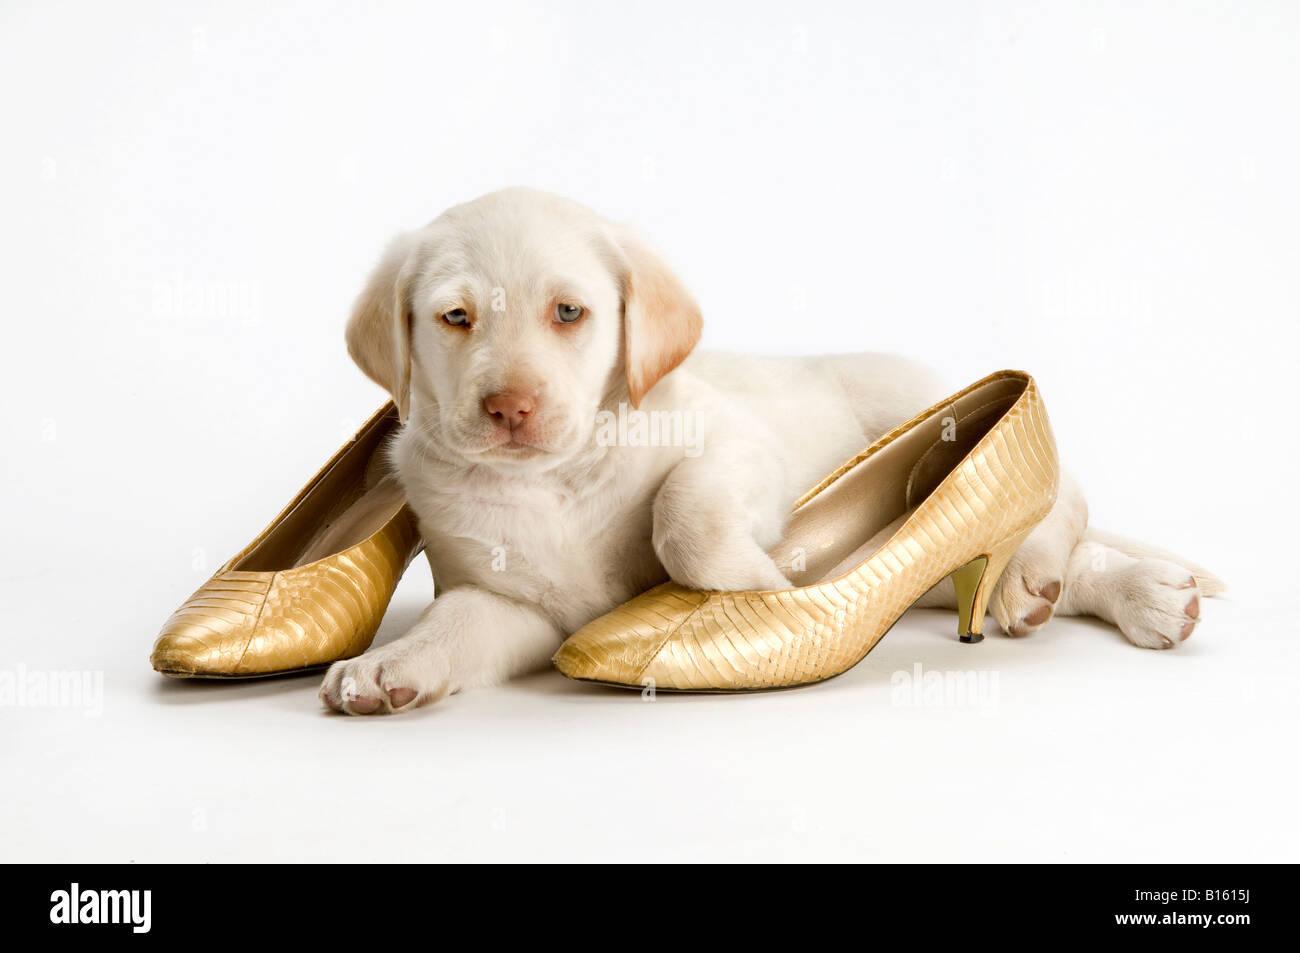 Cachorro Labrador amarillo blanco con zapatos de oro sobre fondo blanco. Imagen De Stock